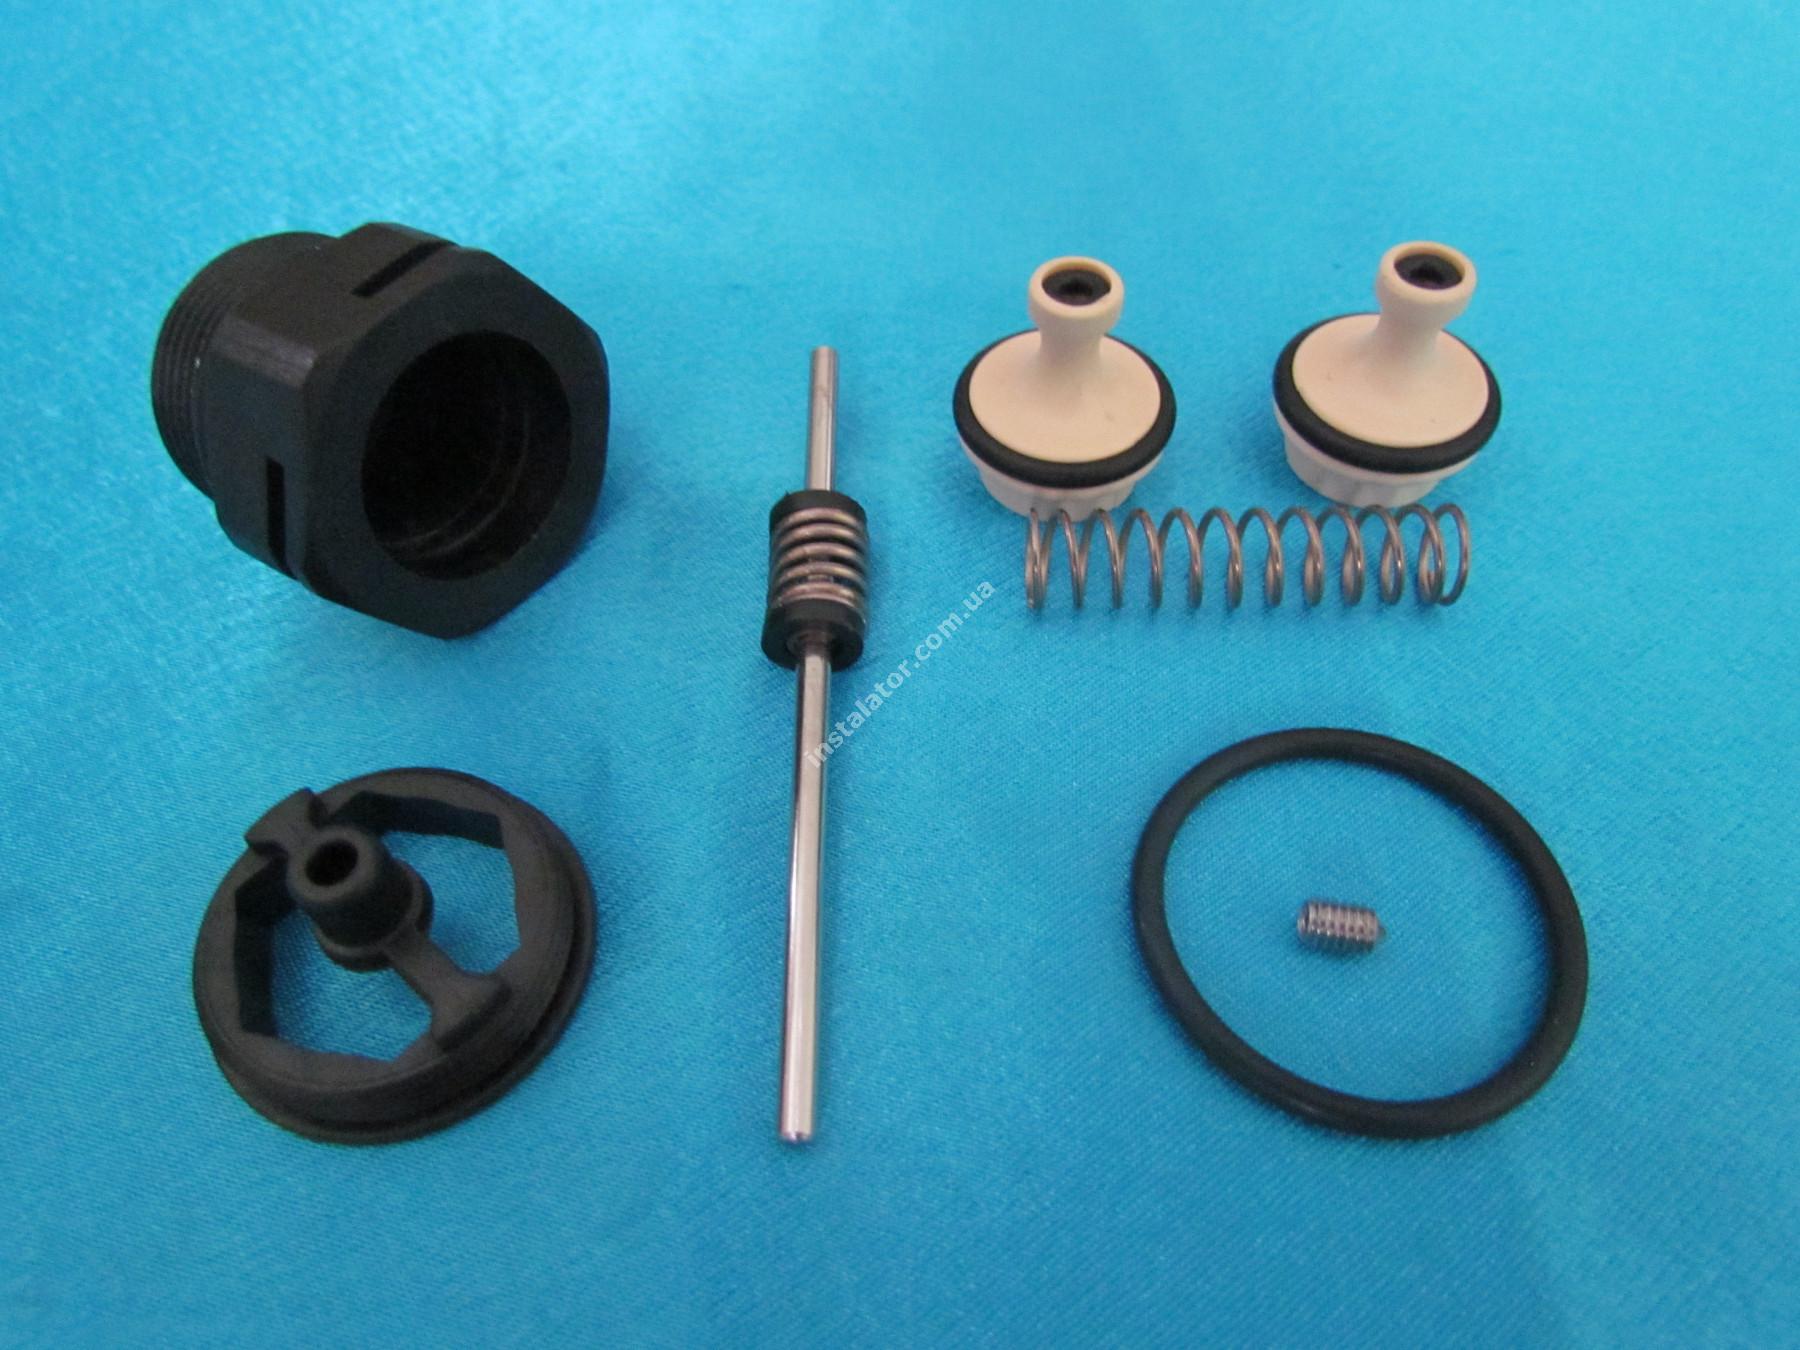 H010006037 Ремкомплект 3-х ходового клапана Micra 2 (новий) full-image-0